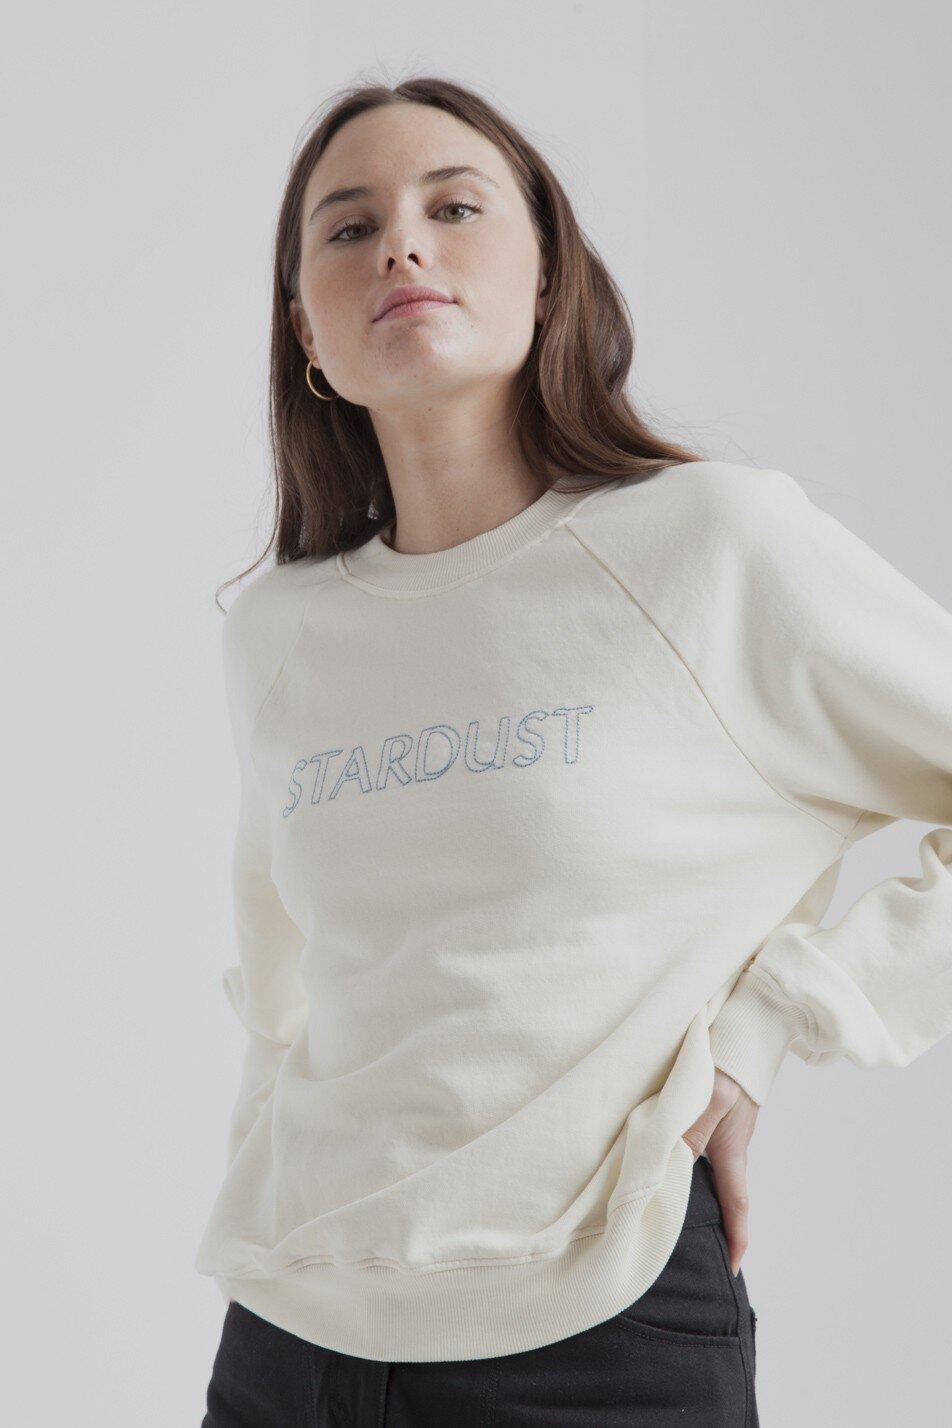 star-dust-raglan-sweatshirt.jpg